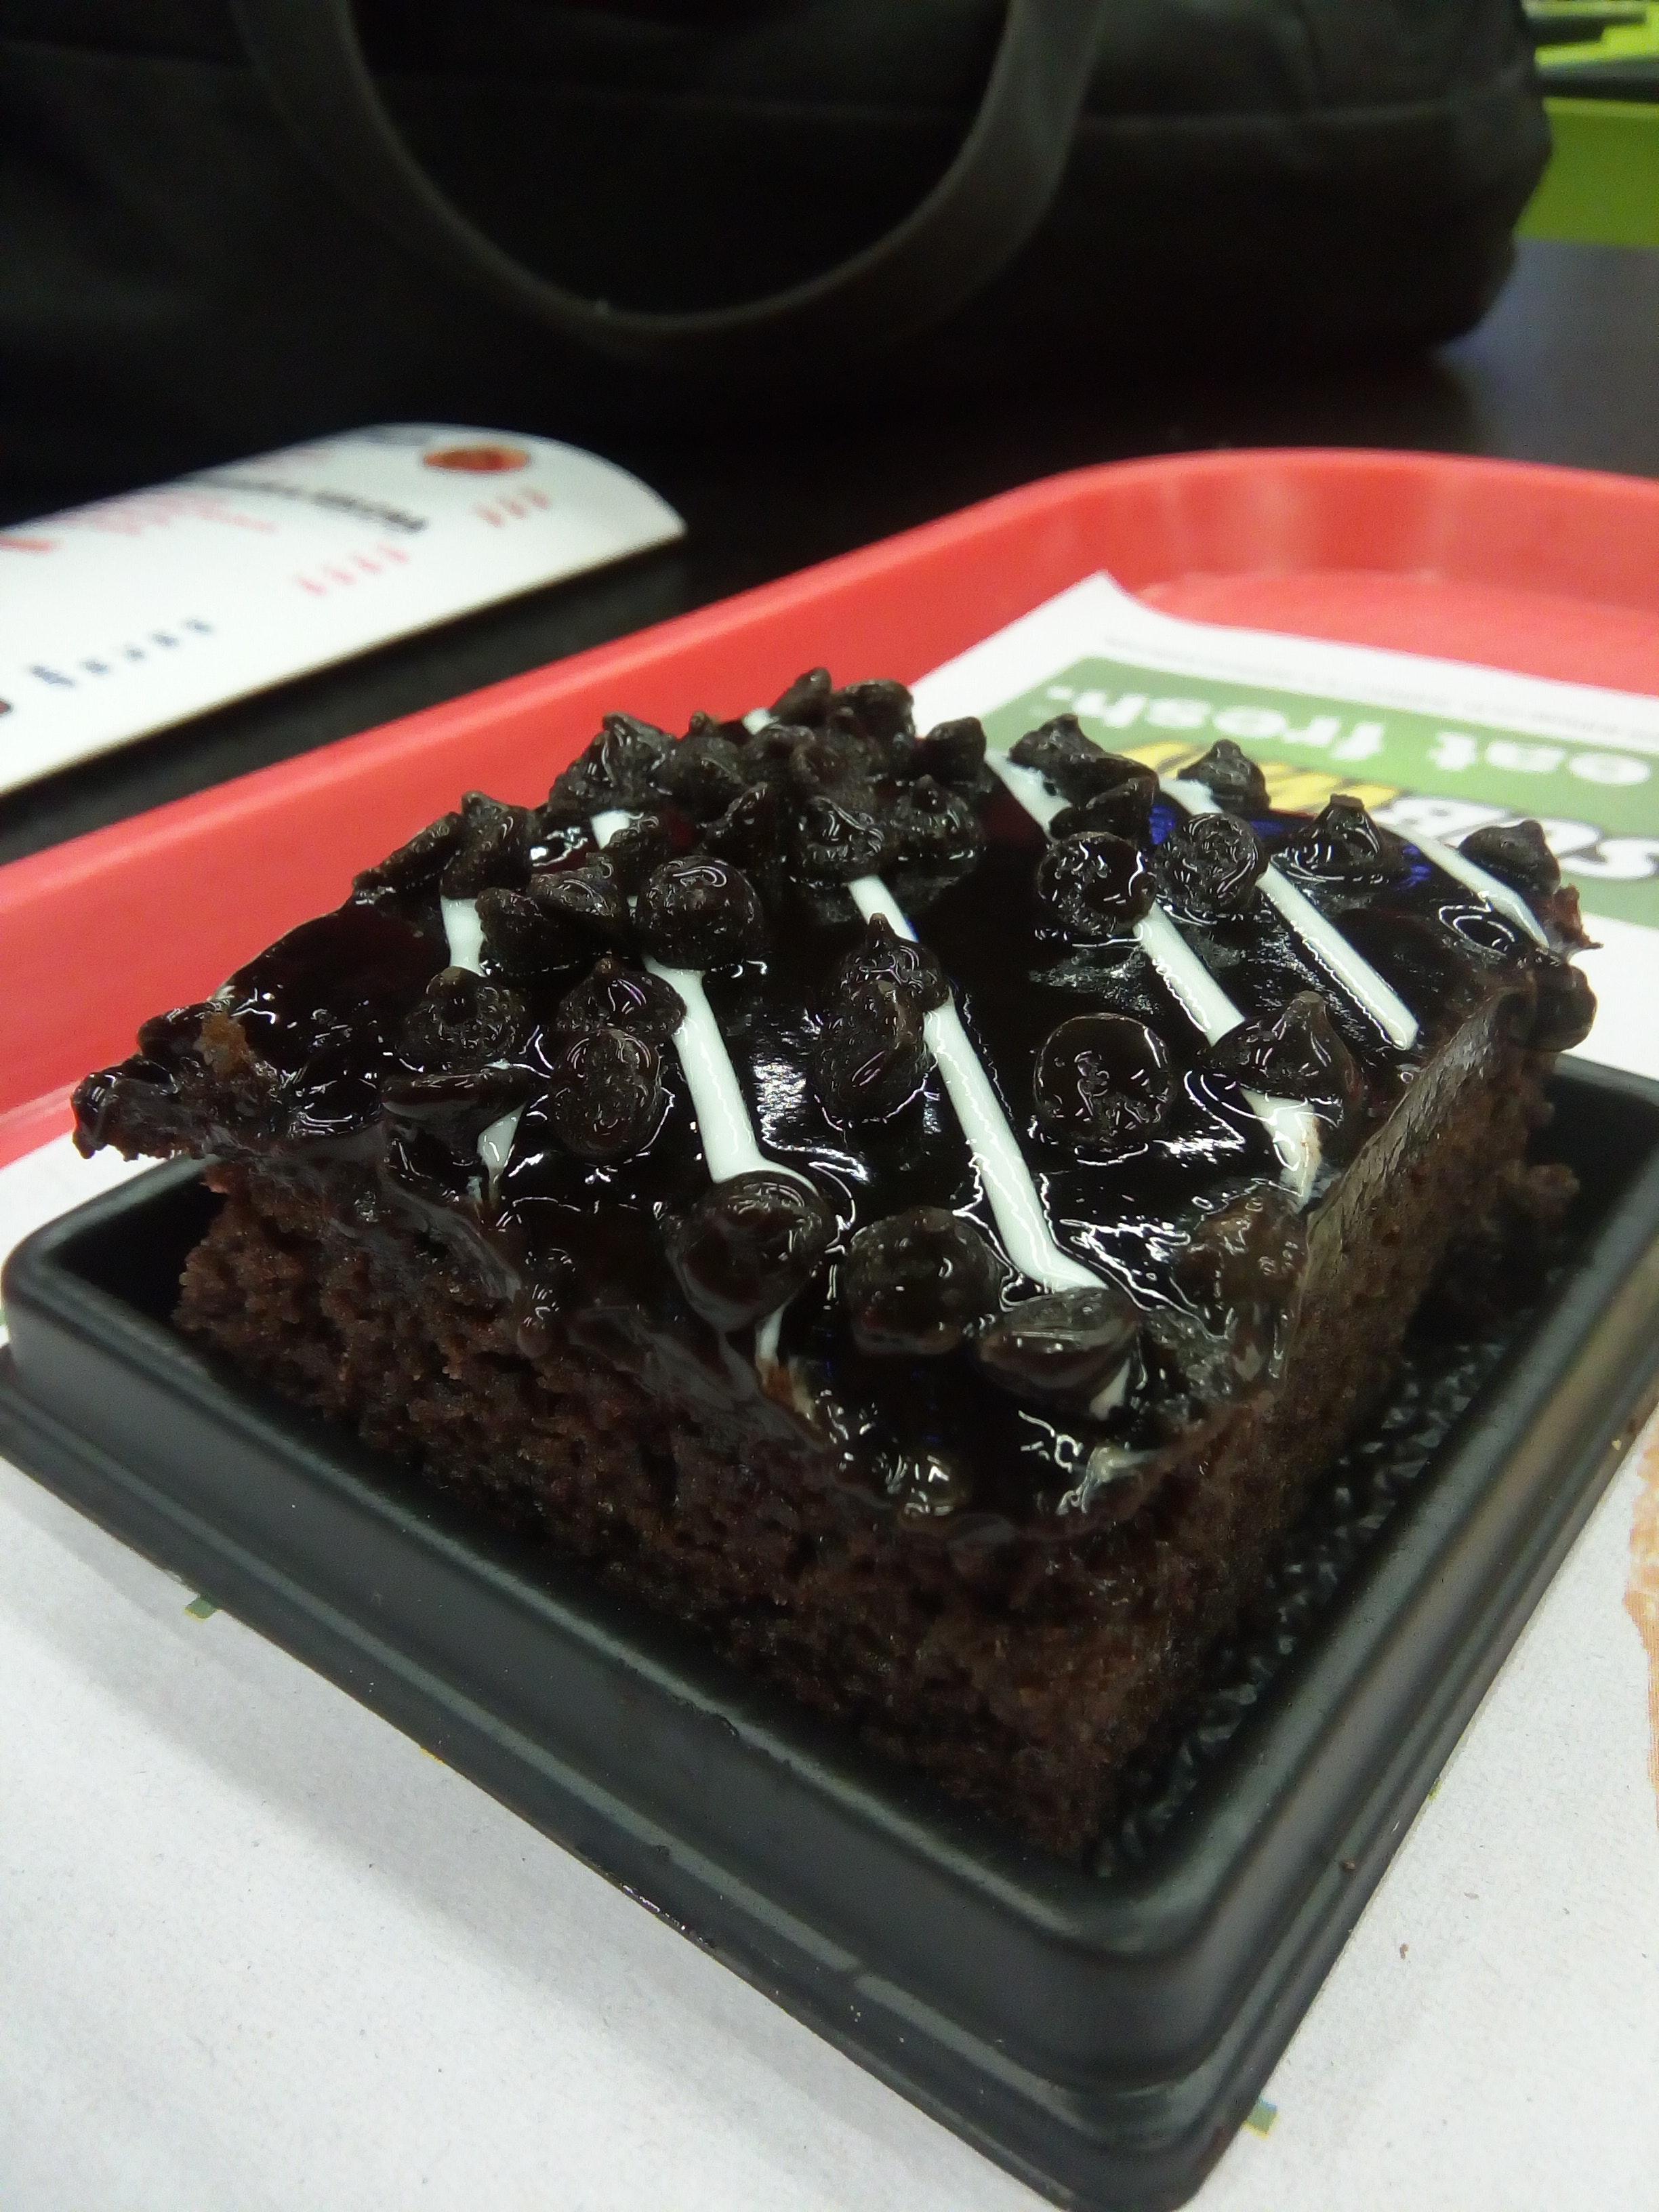 Free stock photo of birthday cake, cake, chocolate cake